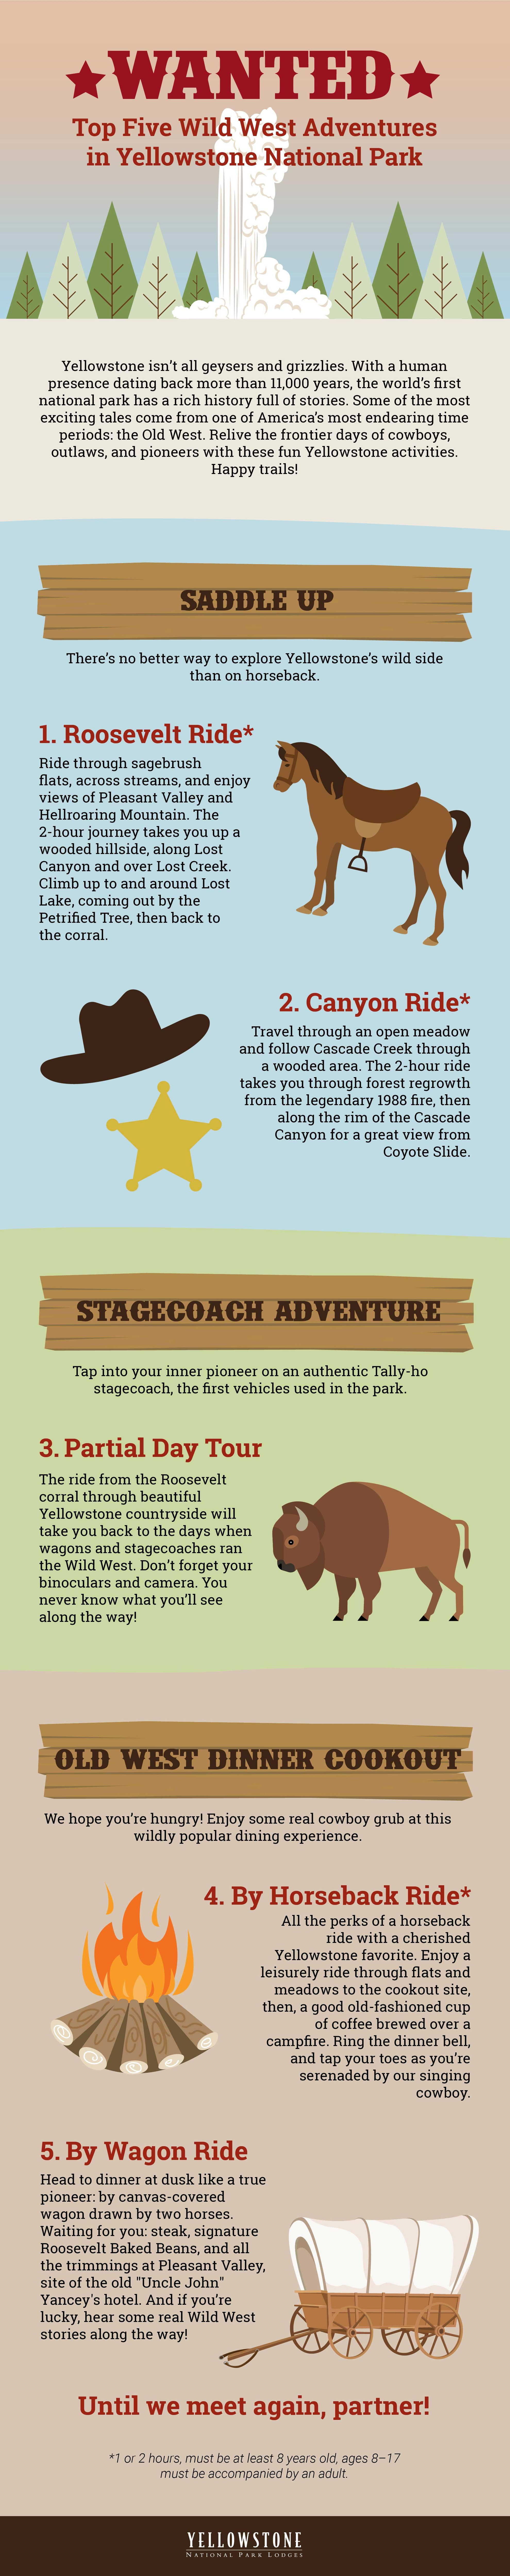 Wild West Infographic